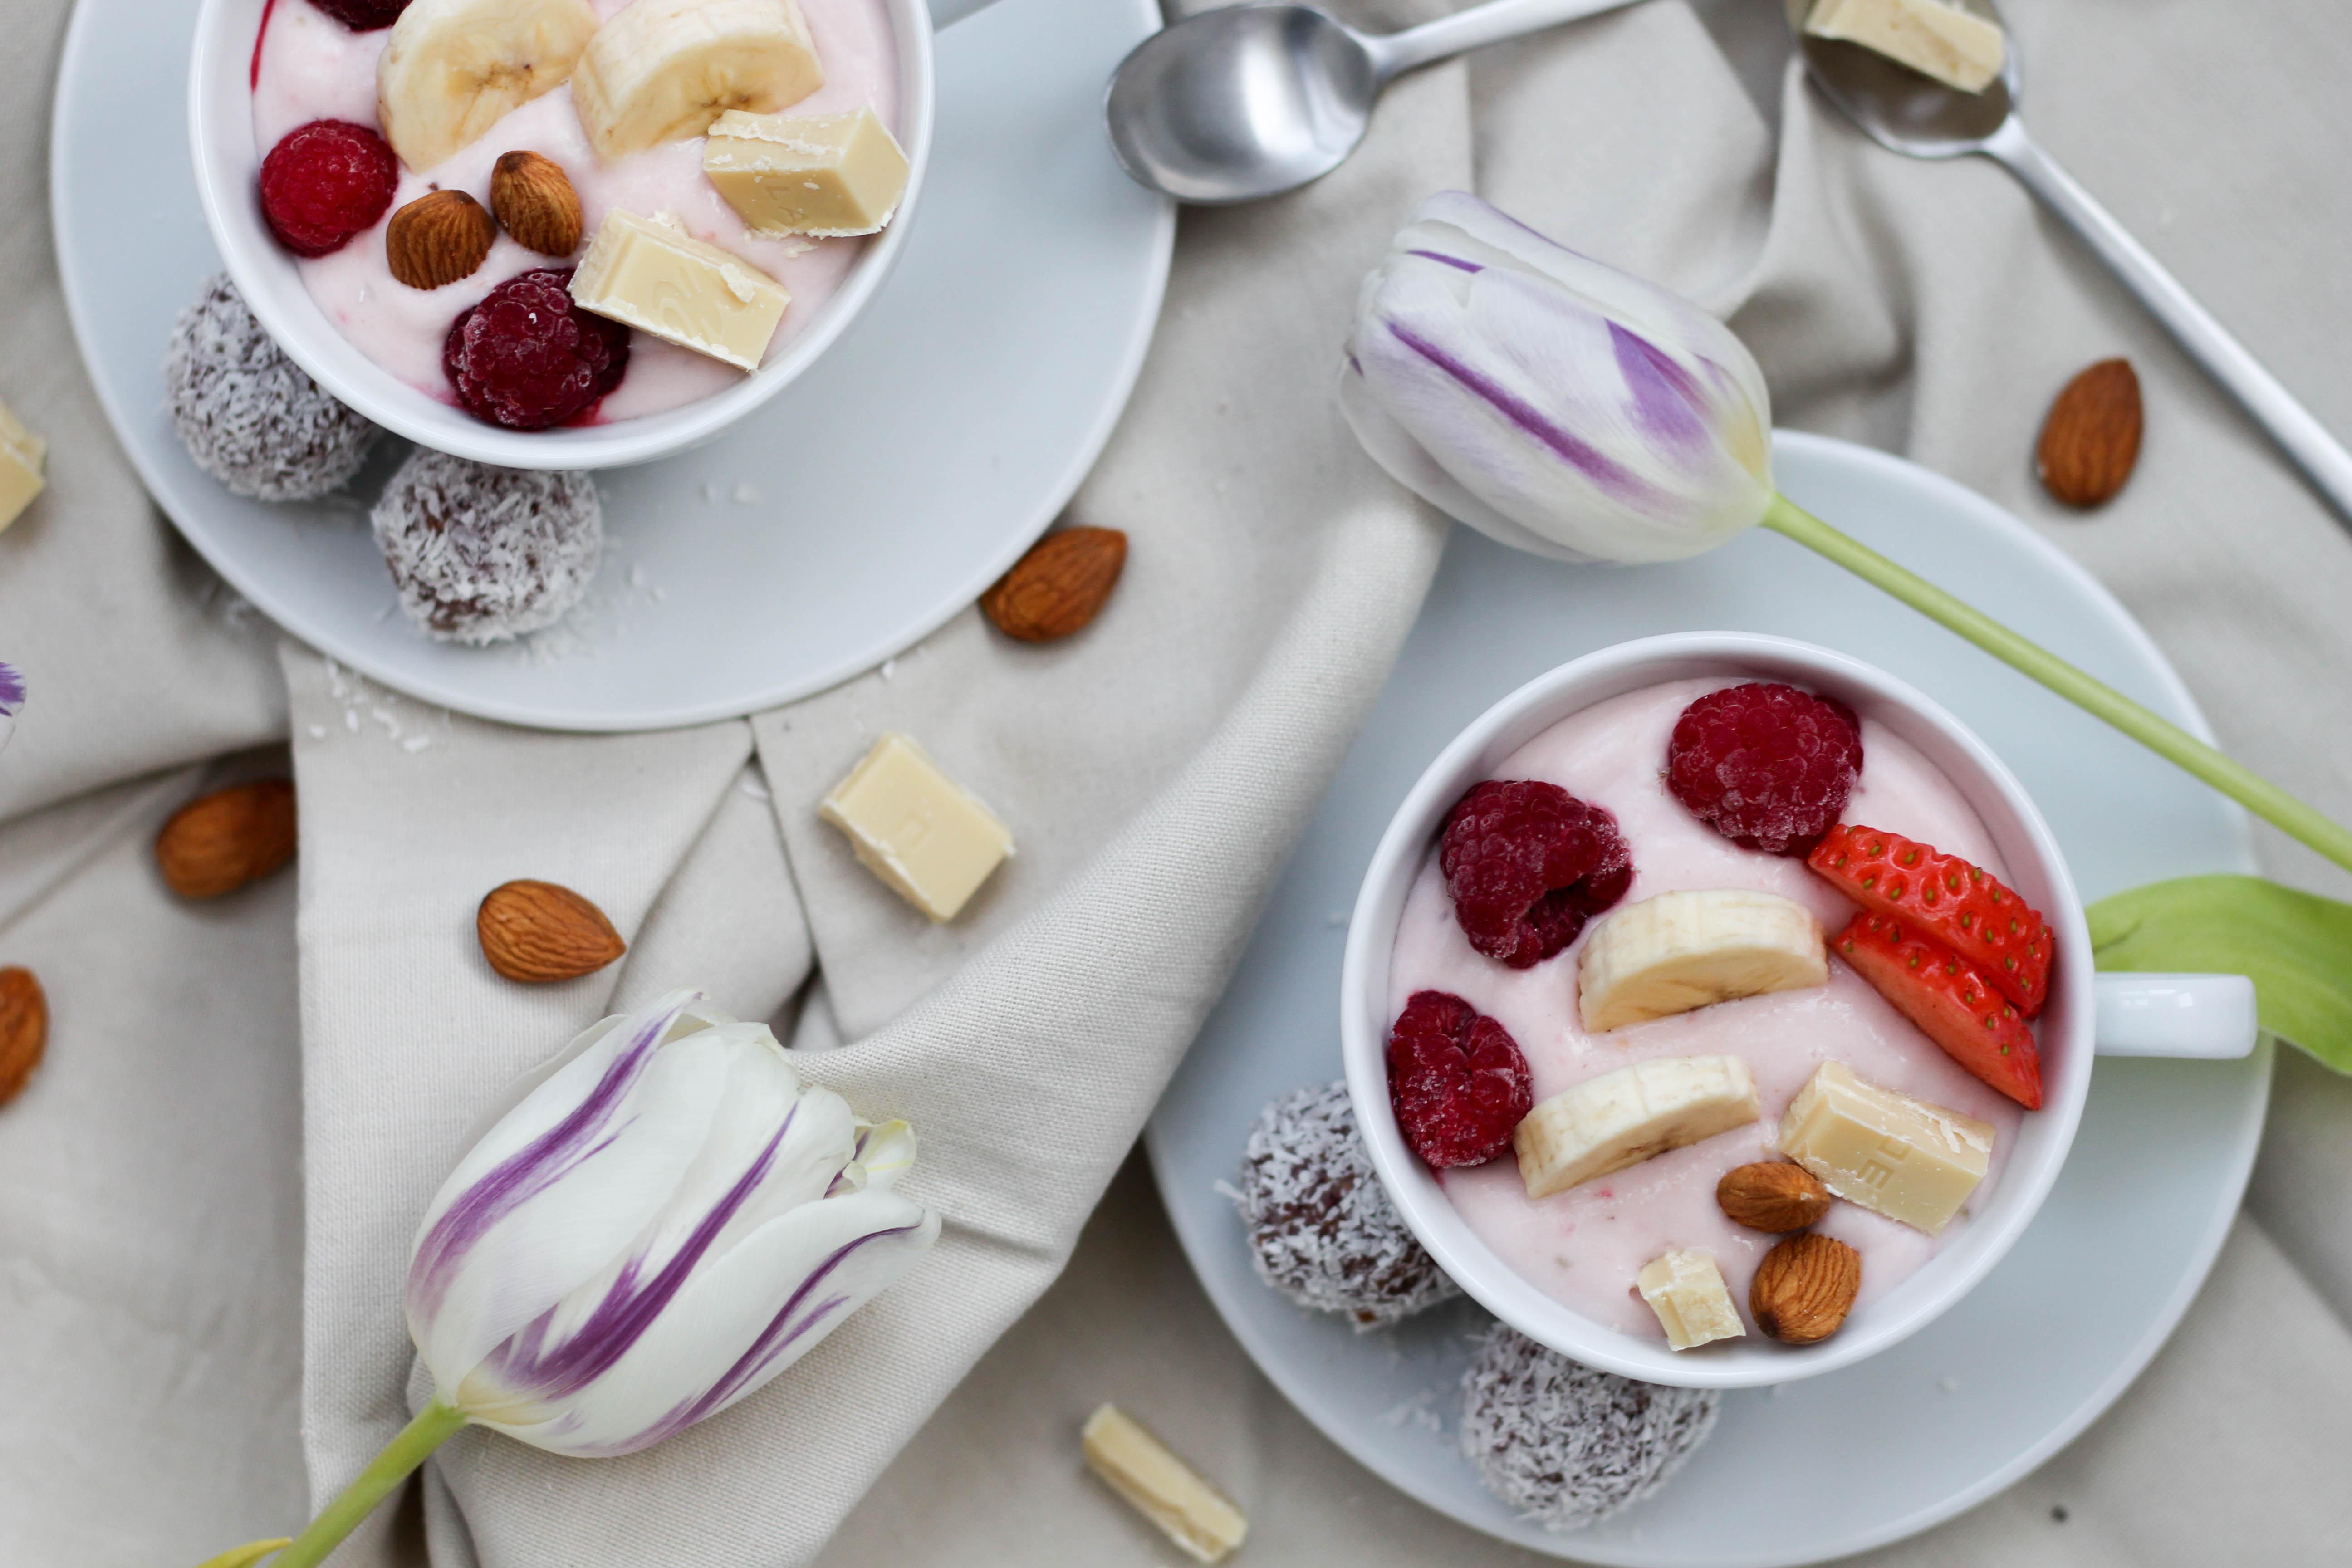 Dein Homespa - Vegan - Plantbased - Healthy - Lifestyle - Relax - Soultime - Smoothie - Bowl - Yoghurt